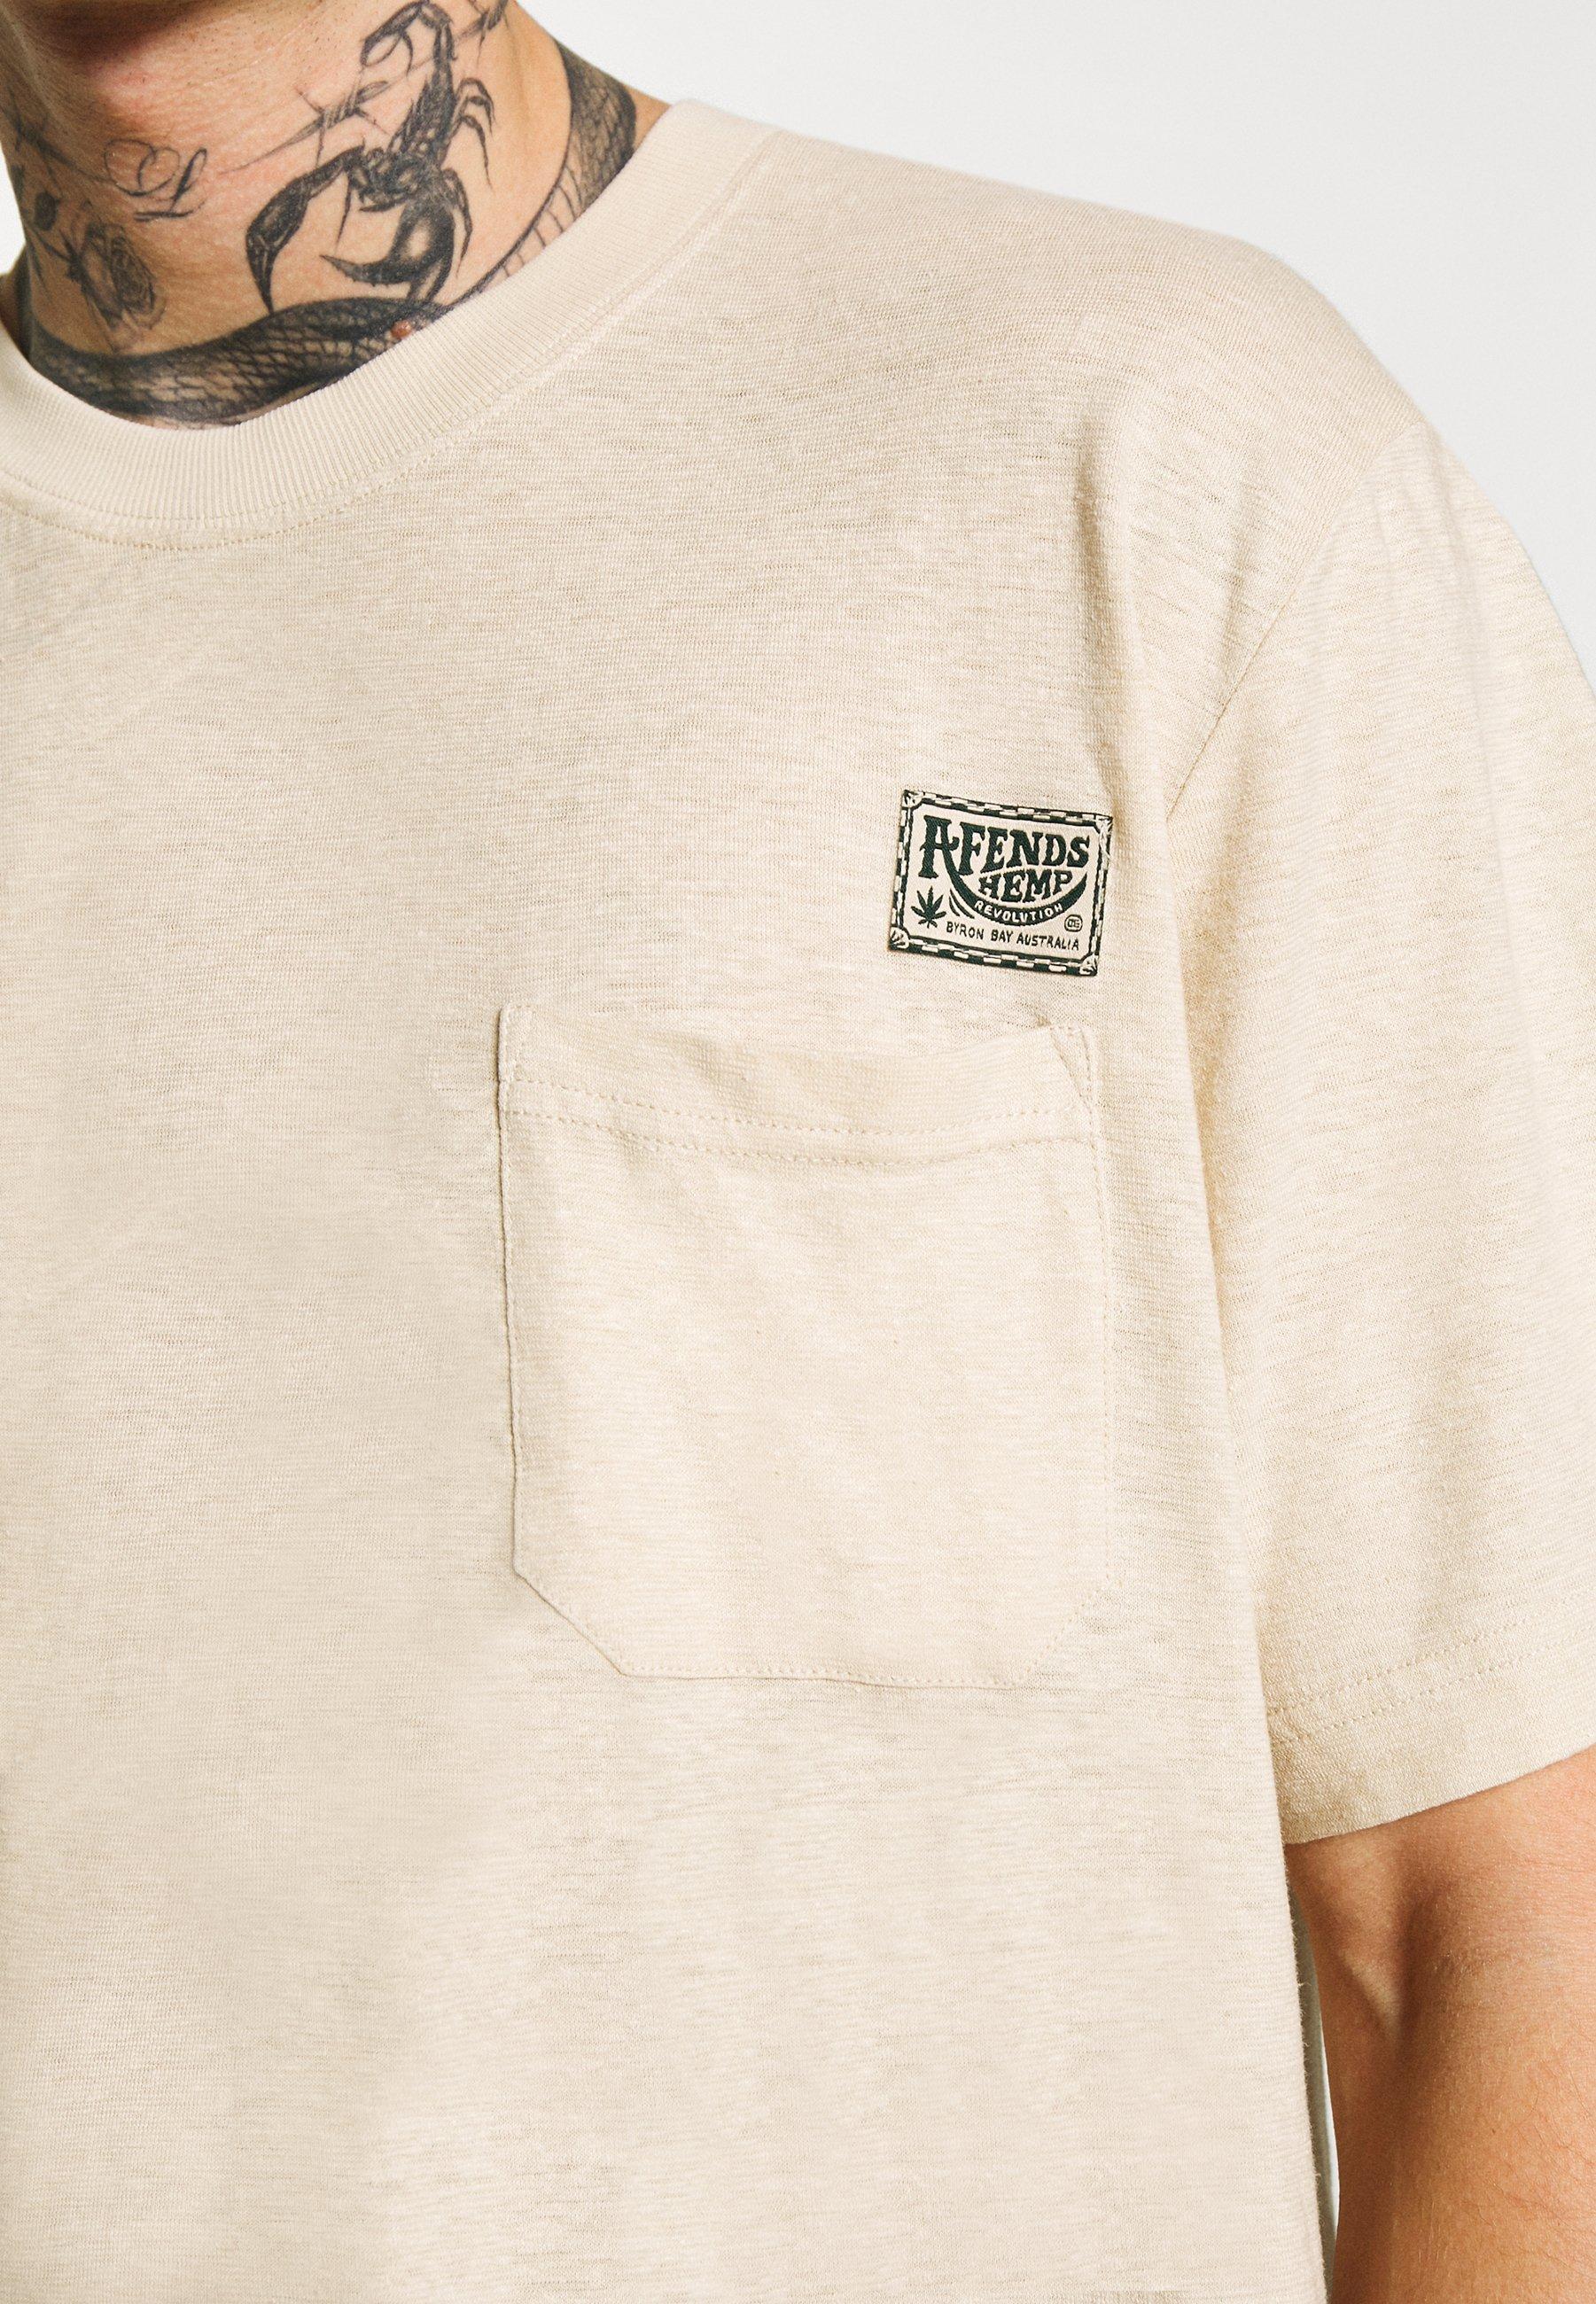 Afends Heritage - Hemp Retro Fit Tee T-shirt Con Stampa Macadamia ZiOm3